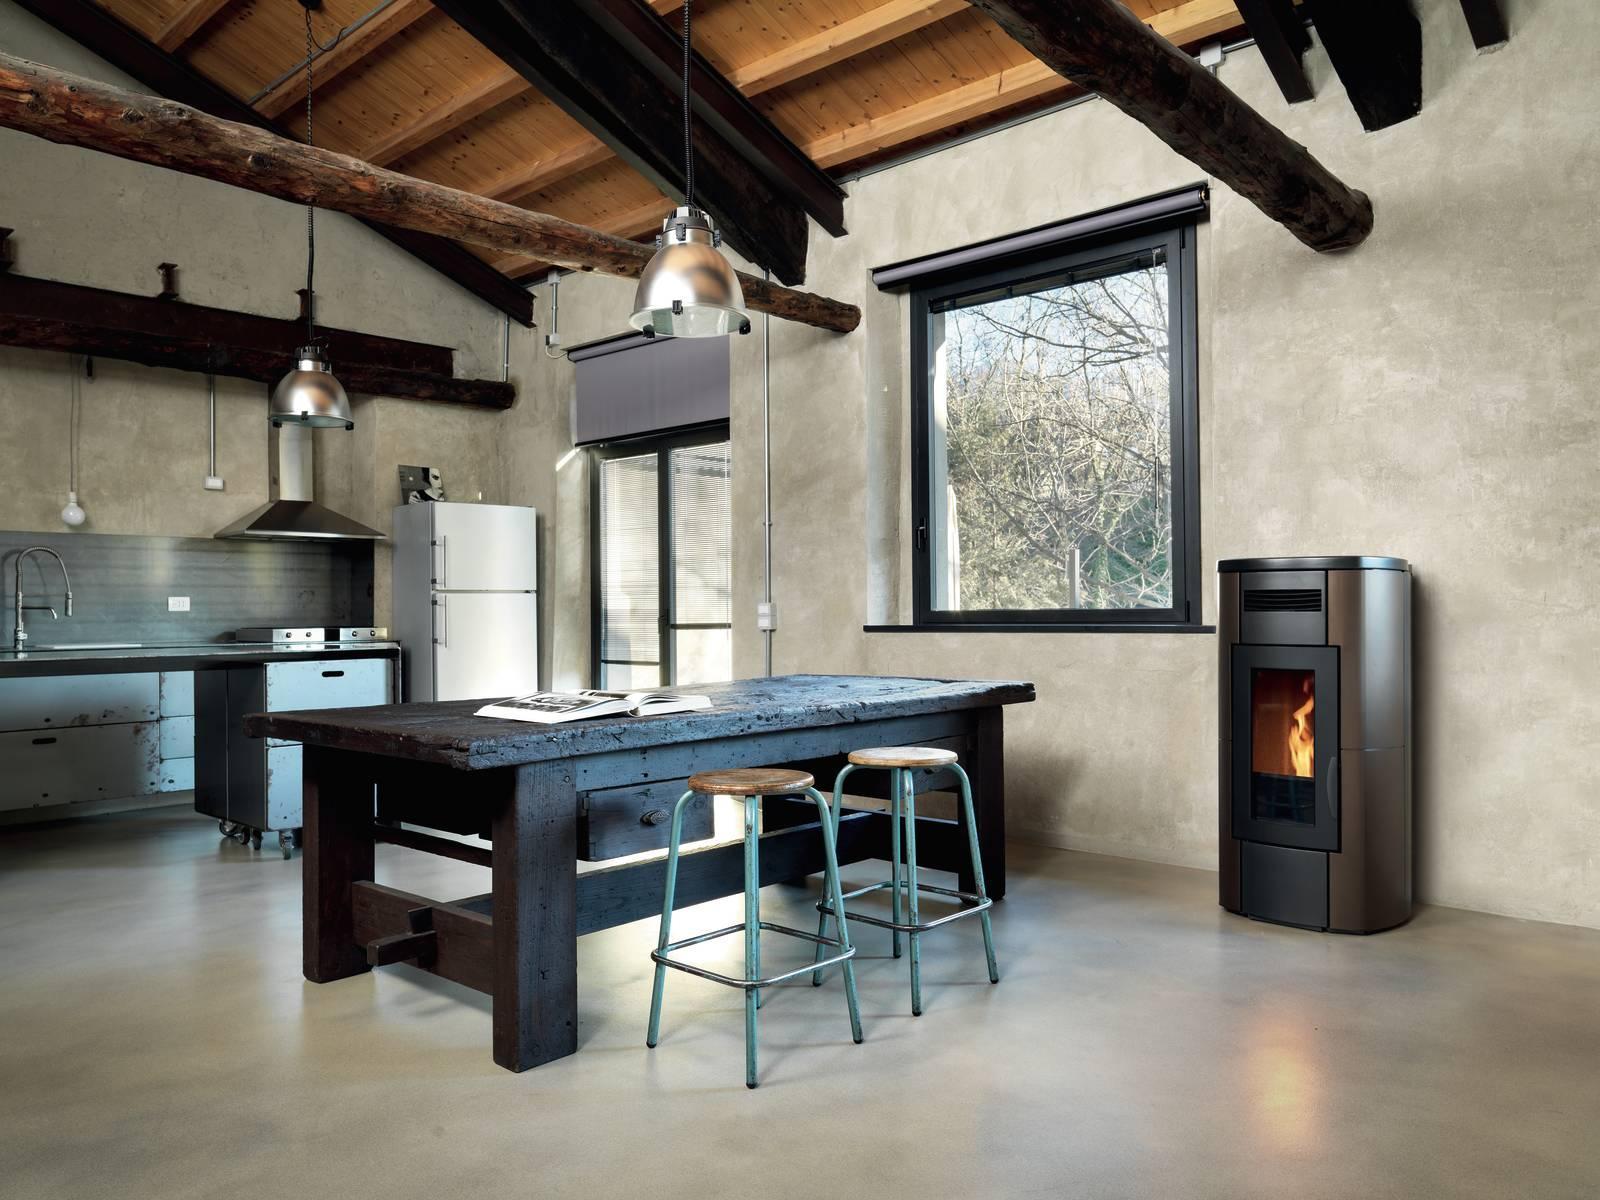 Cenere Di Pellet Nell Orto stufe a pellet ad alta efficienza - cose di casa